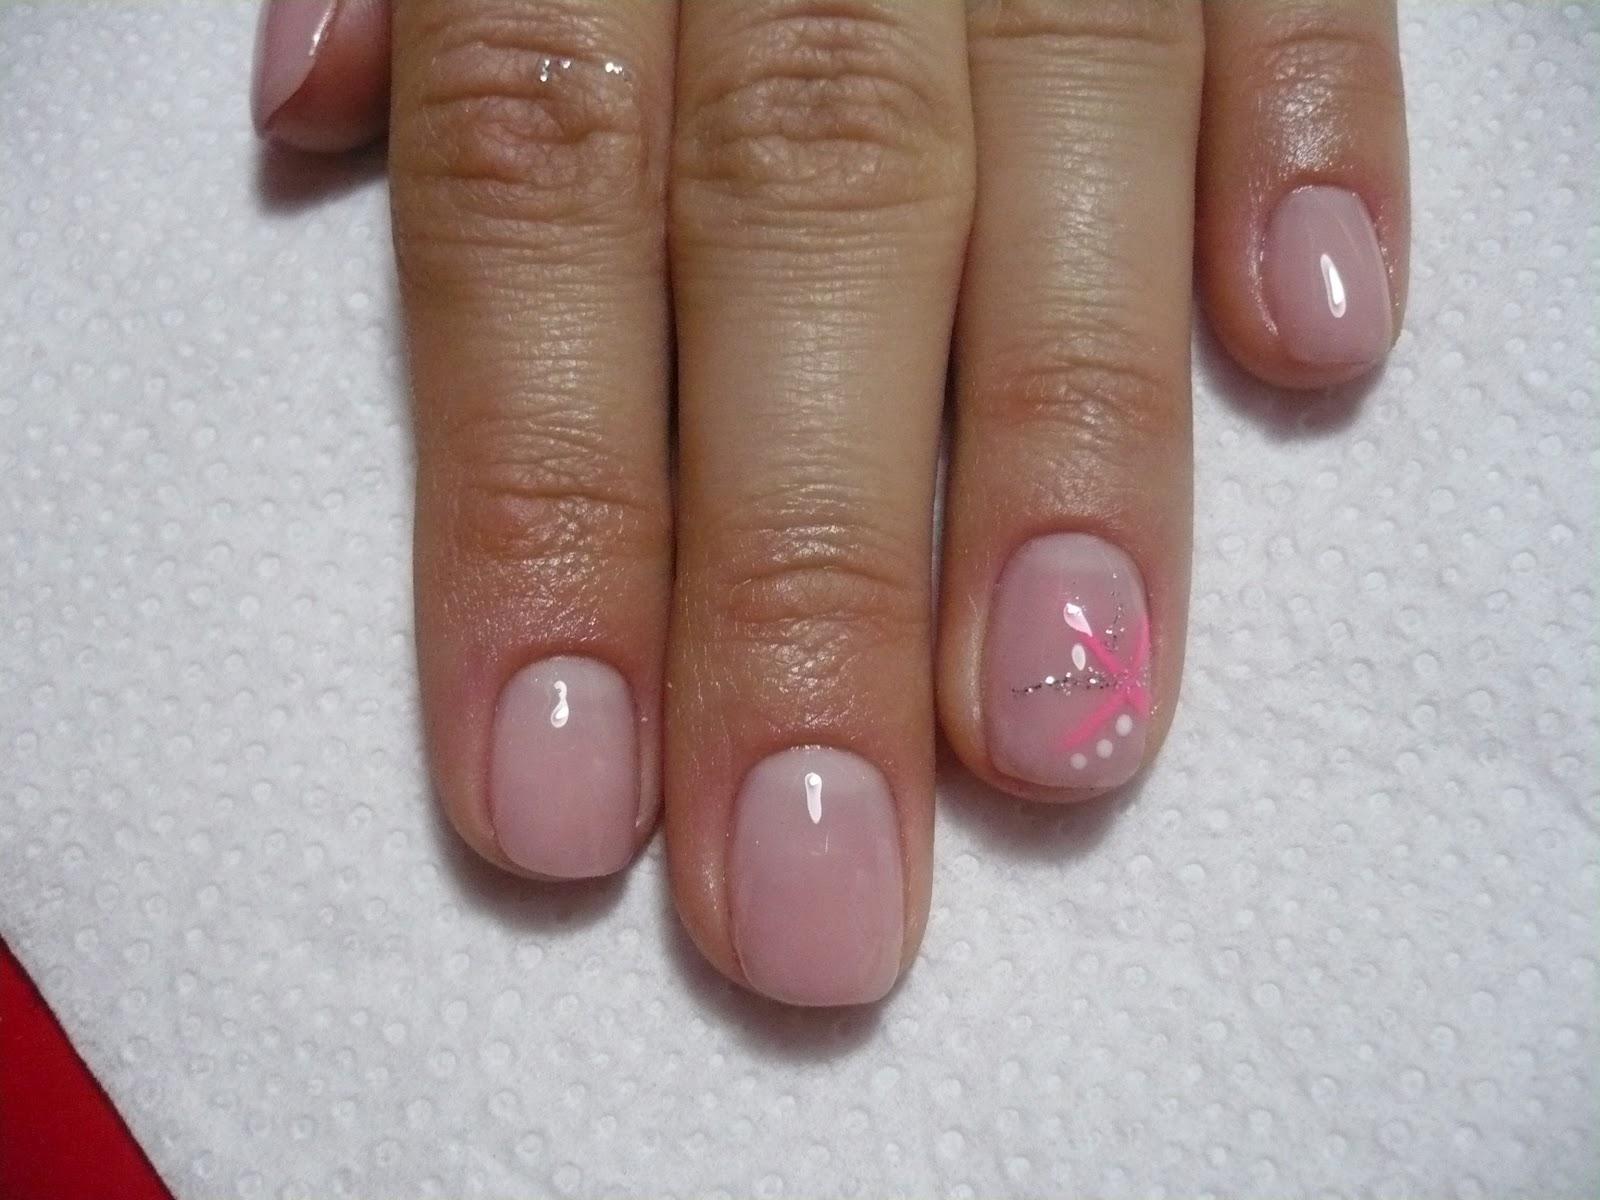 lume gel nails photo - 2